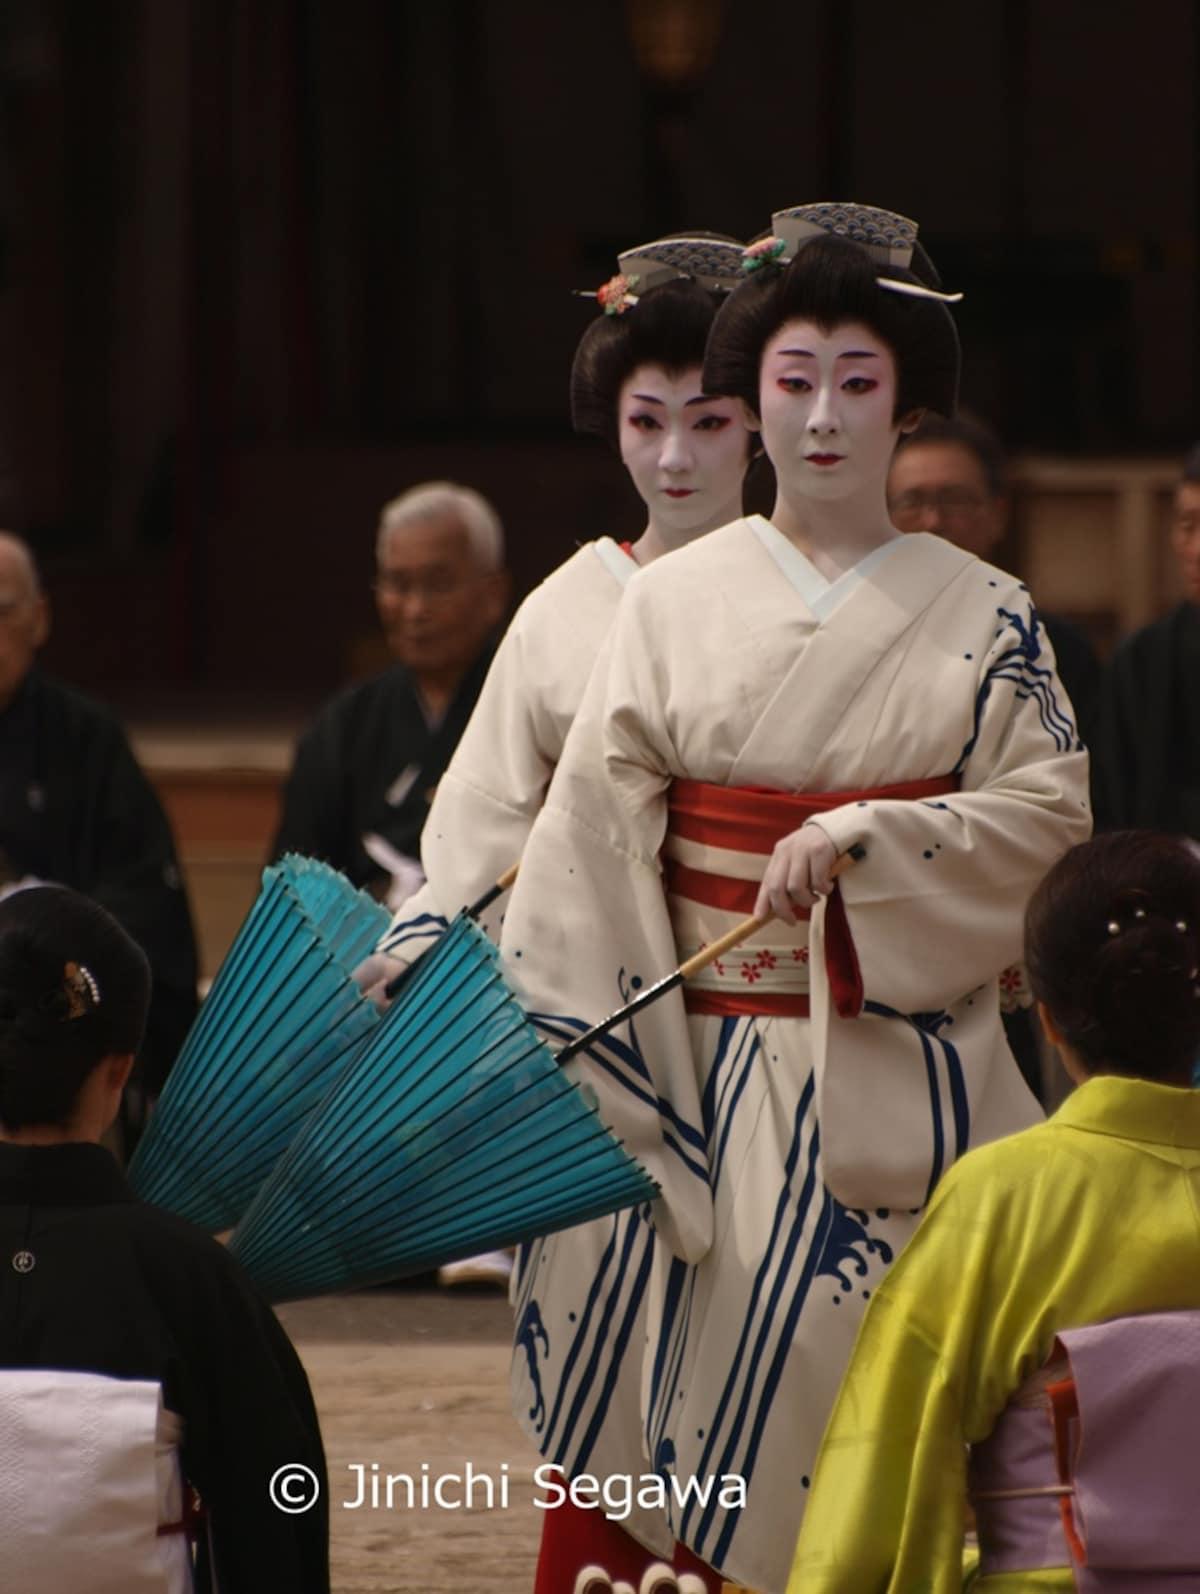 4. Traditional Dances